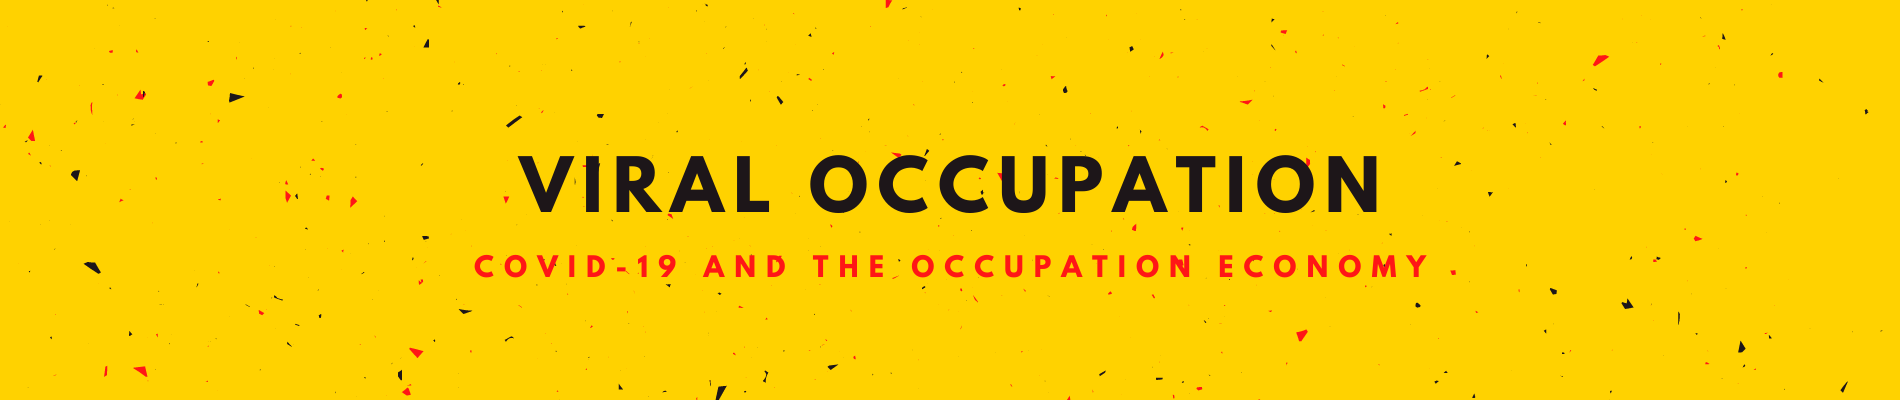 viral occupation